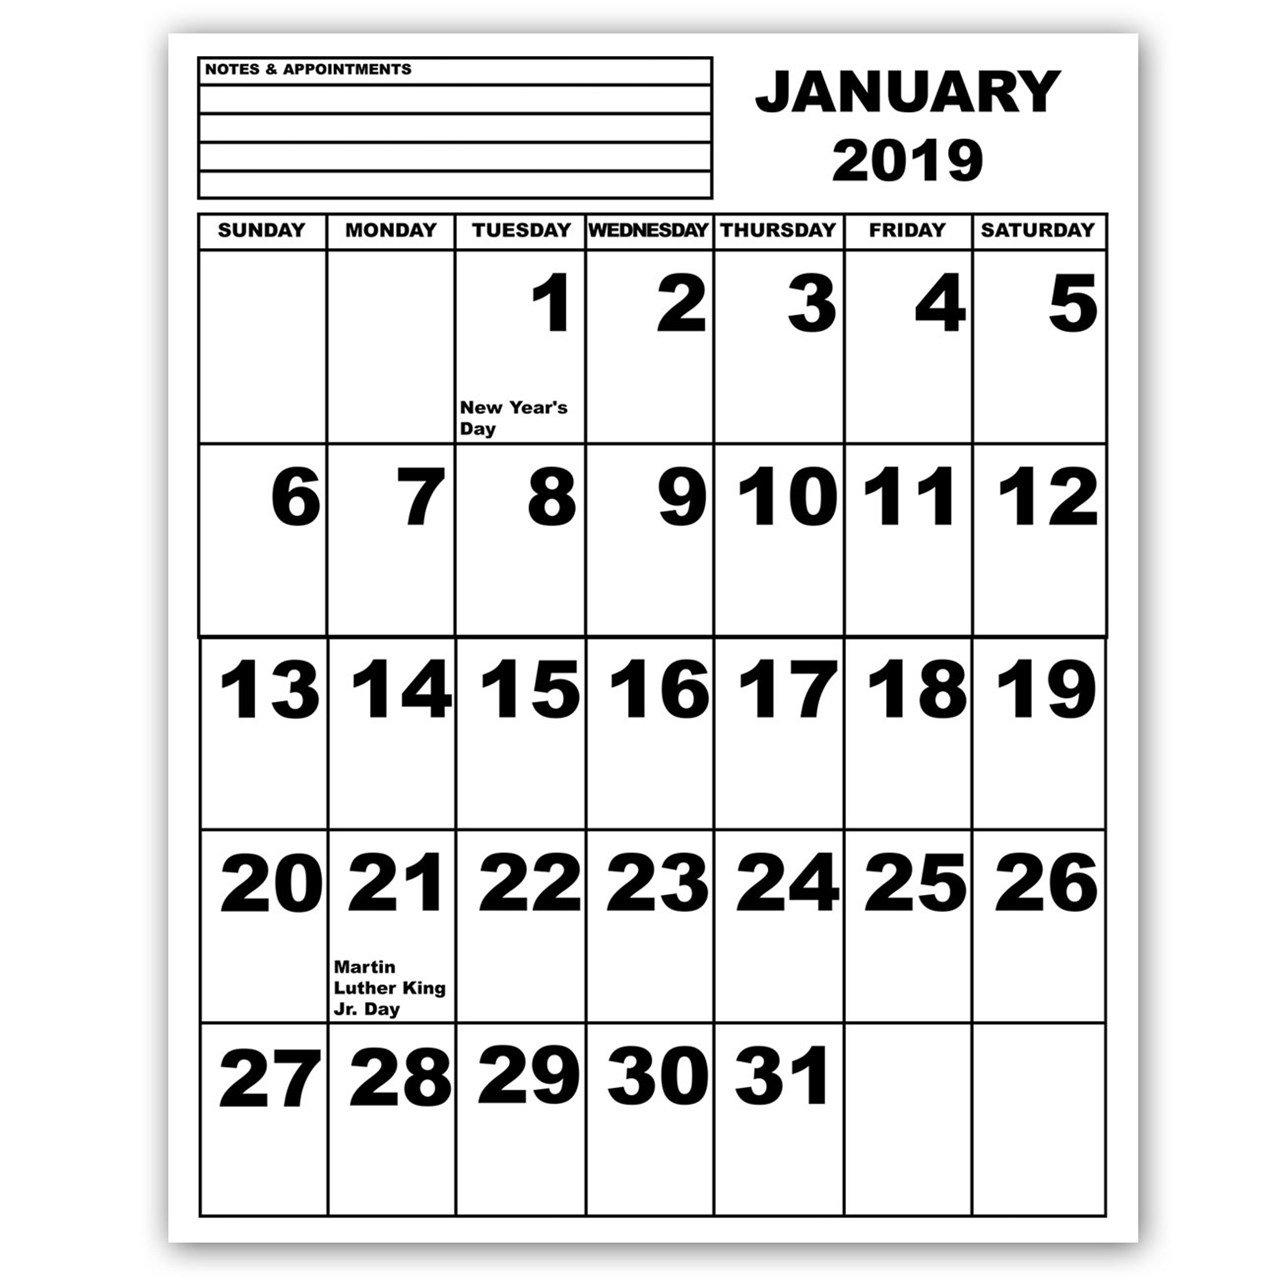 Maxiaids | Jumbo Print Calendar - 2019 Calendar 2019 For Print